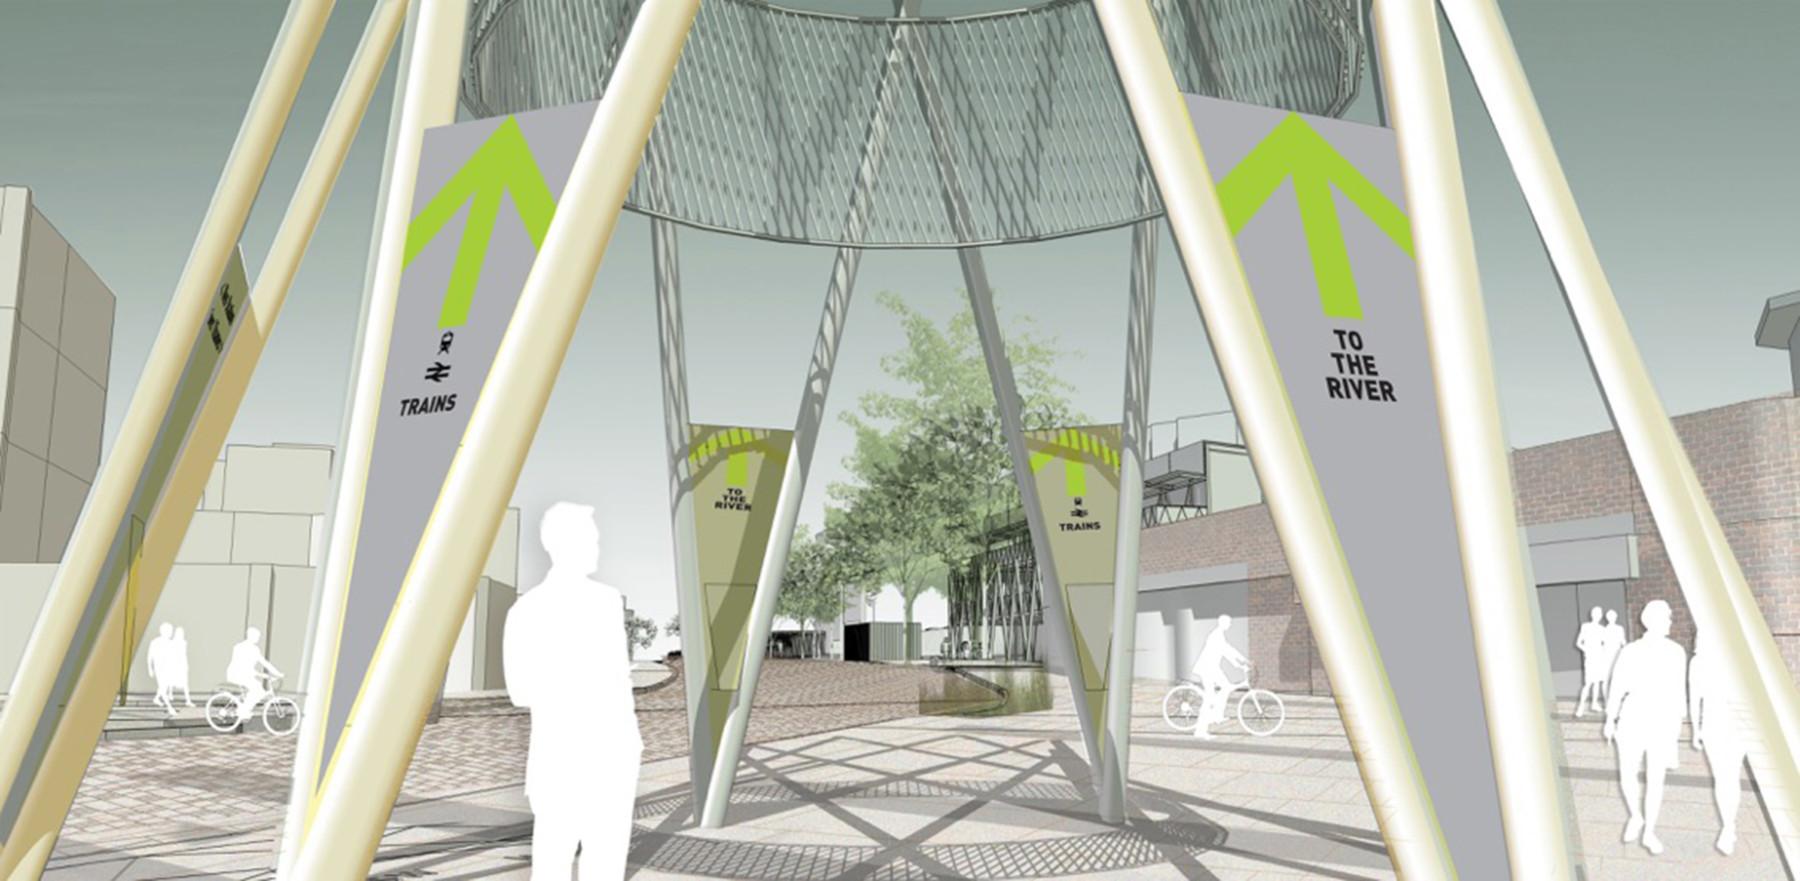 Sarah-Wigglesworth-Architects Kingston-Mini-Holland Beacon 5 Detail 3600